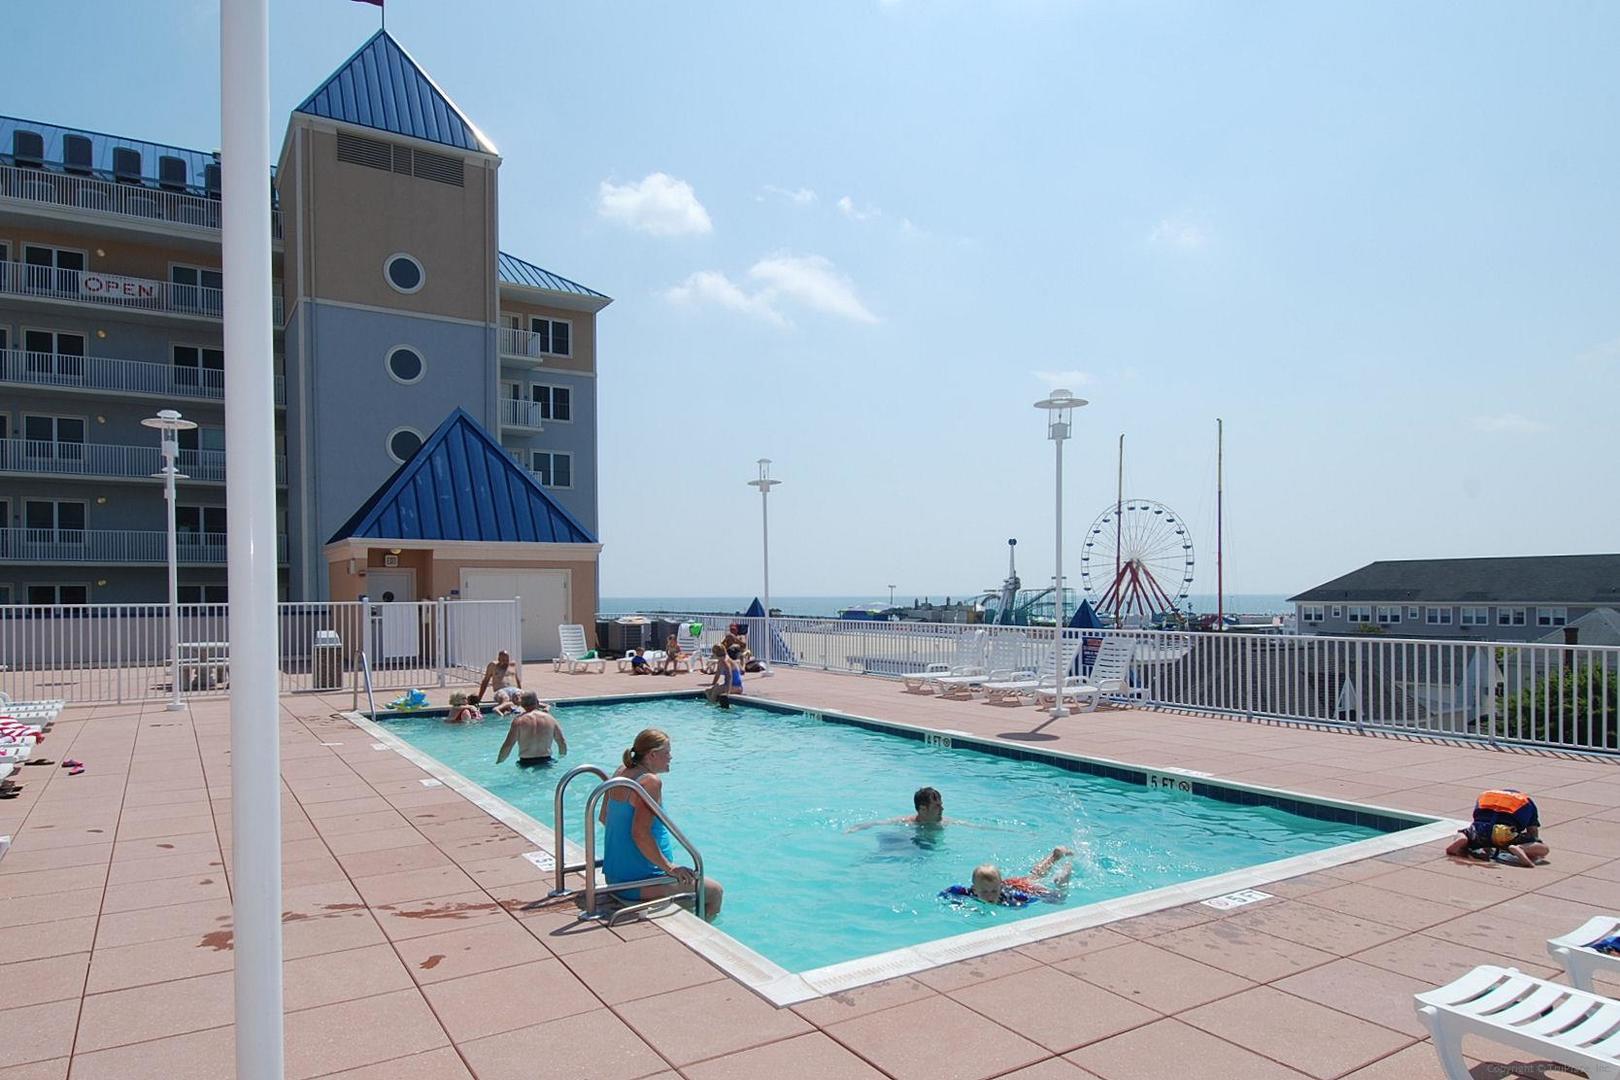 Belmont Towers Rooftop Pool (open seasonally)